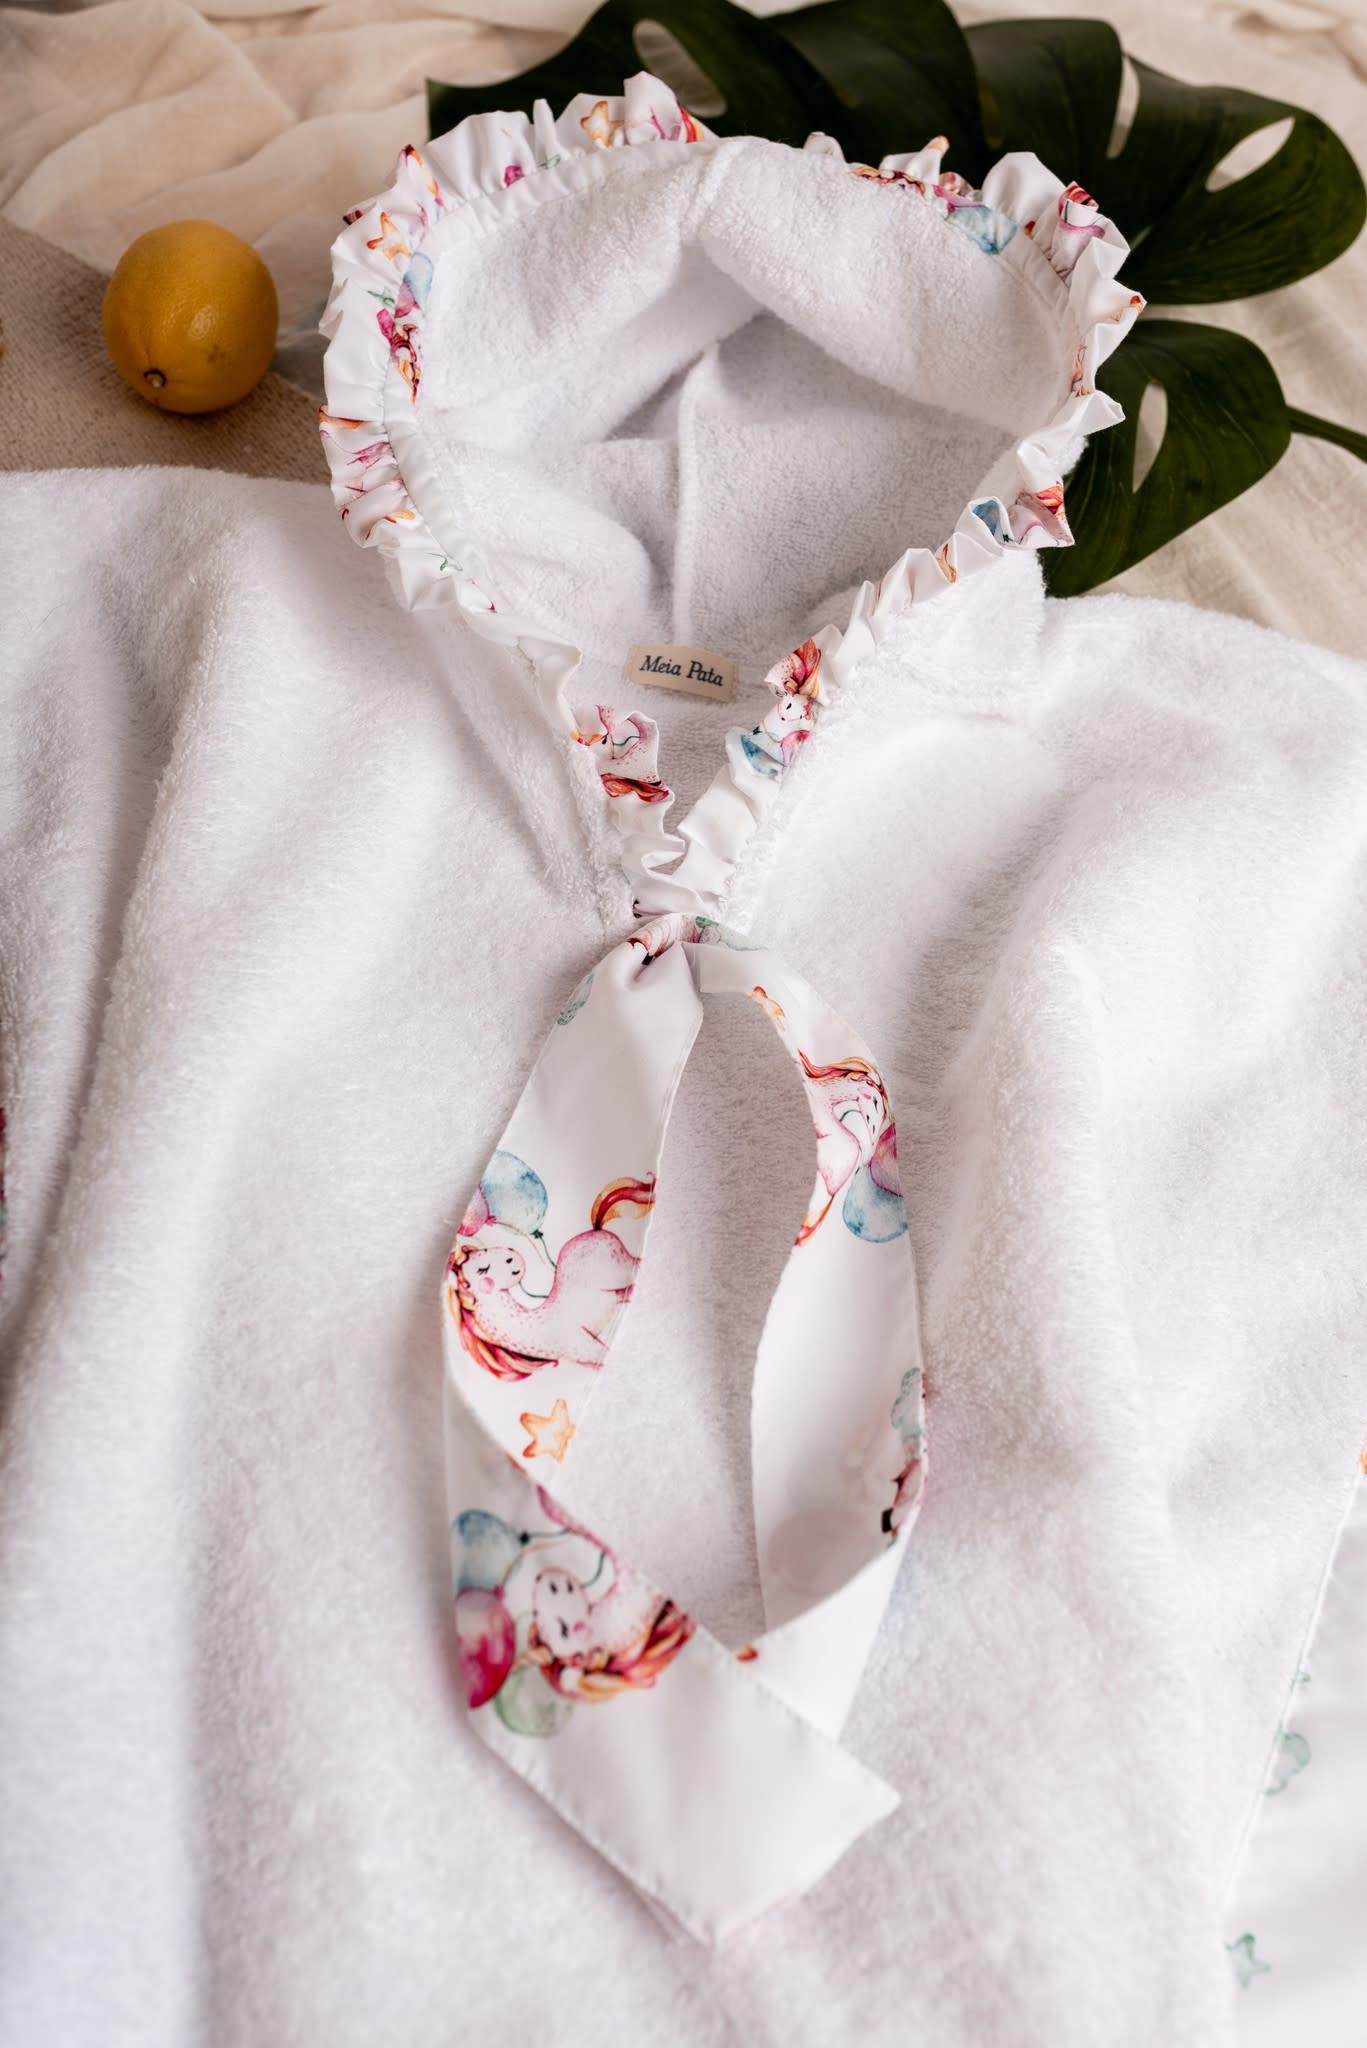 Meia Pata Meia Pata Unicorn Towel Poncho S21